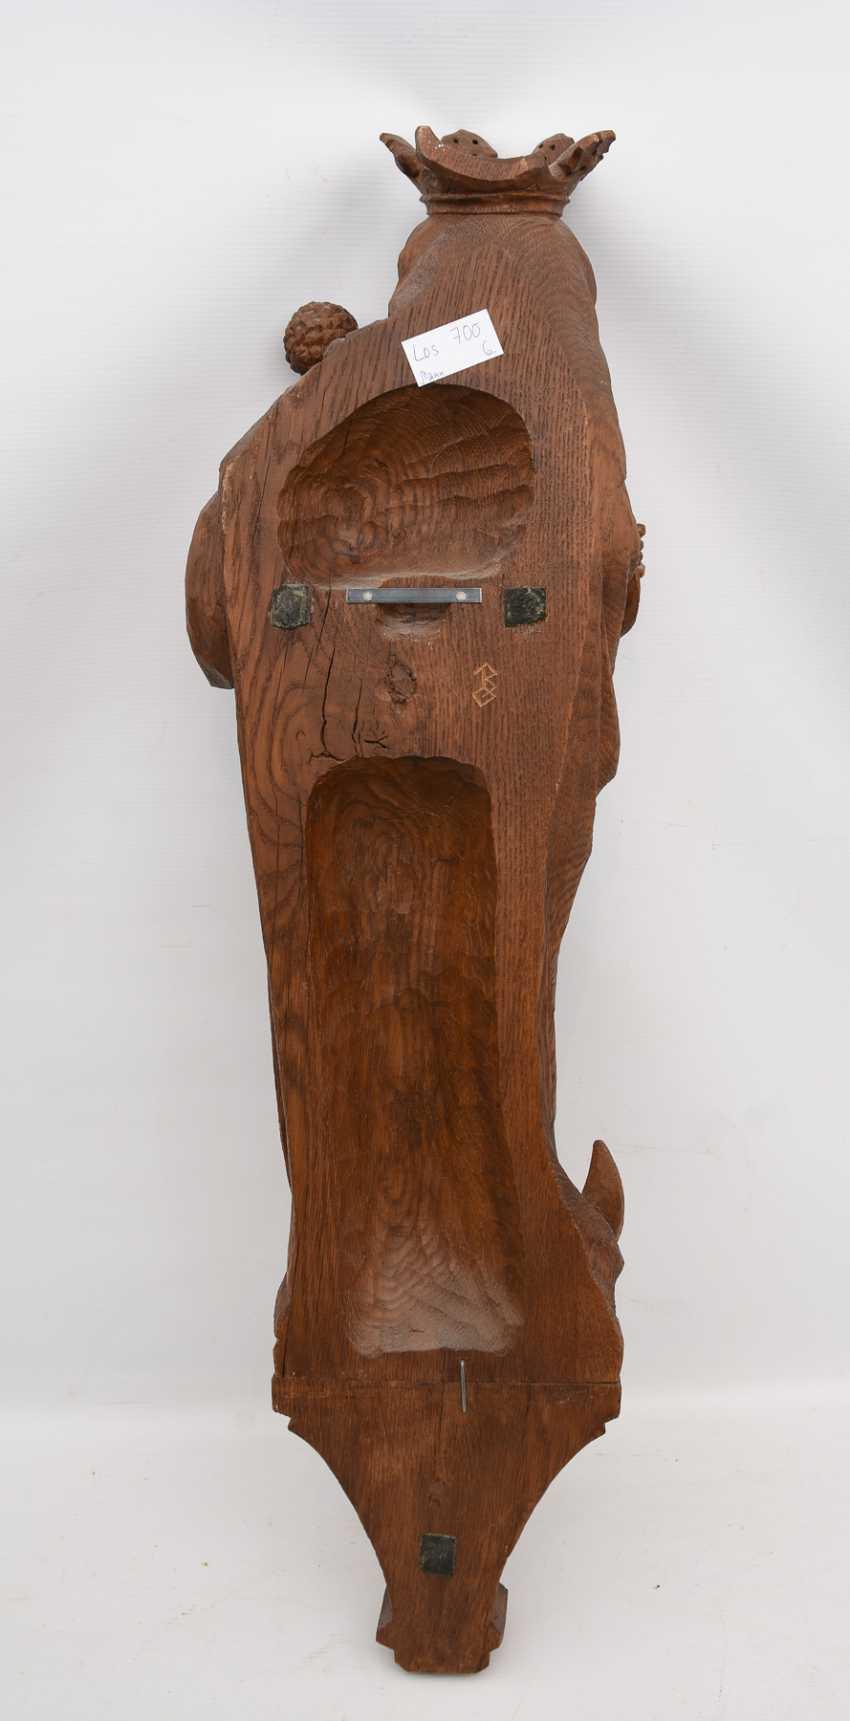 "Bracket figure ""MADONNA"" beschnitztes wood, monogrammed, Germany 20. Century - photo 3"